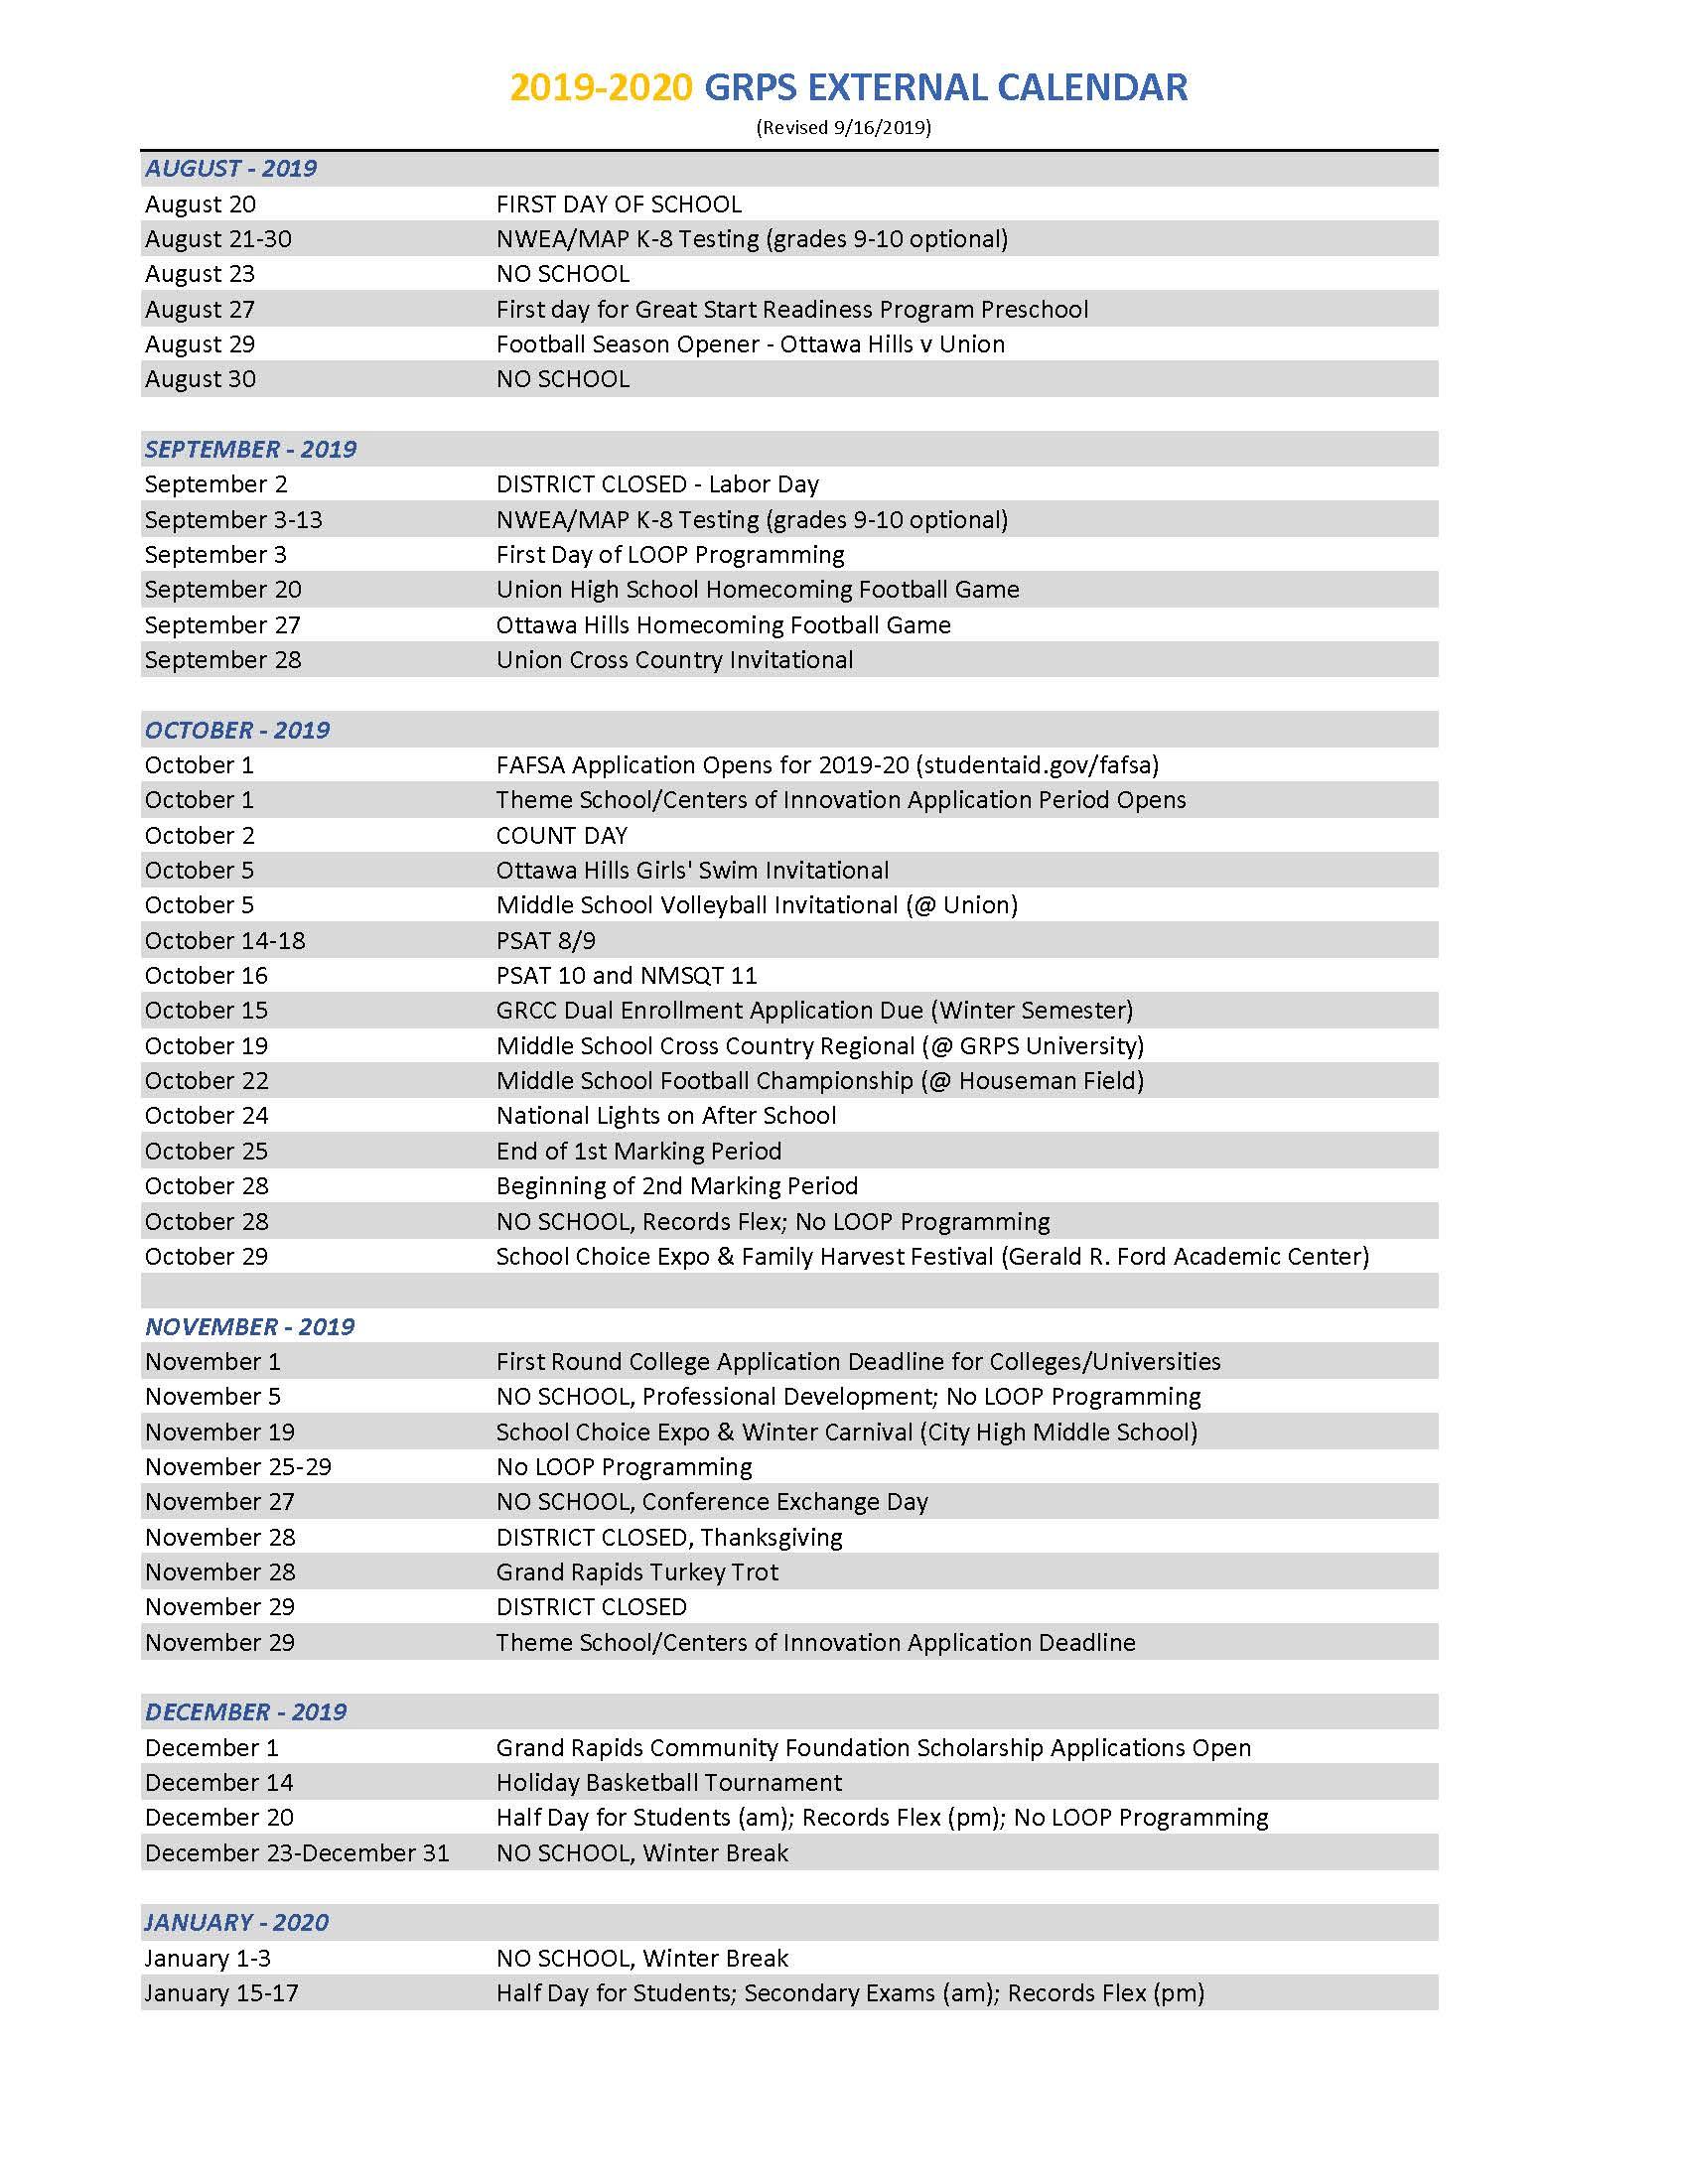 2019-2020 District Calendar for Grps School Calendar 2021